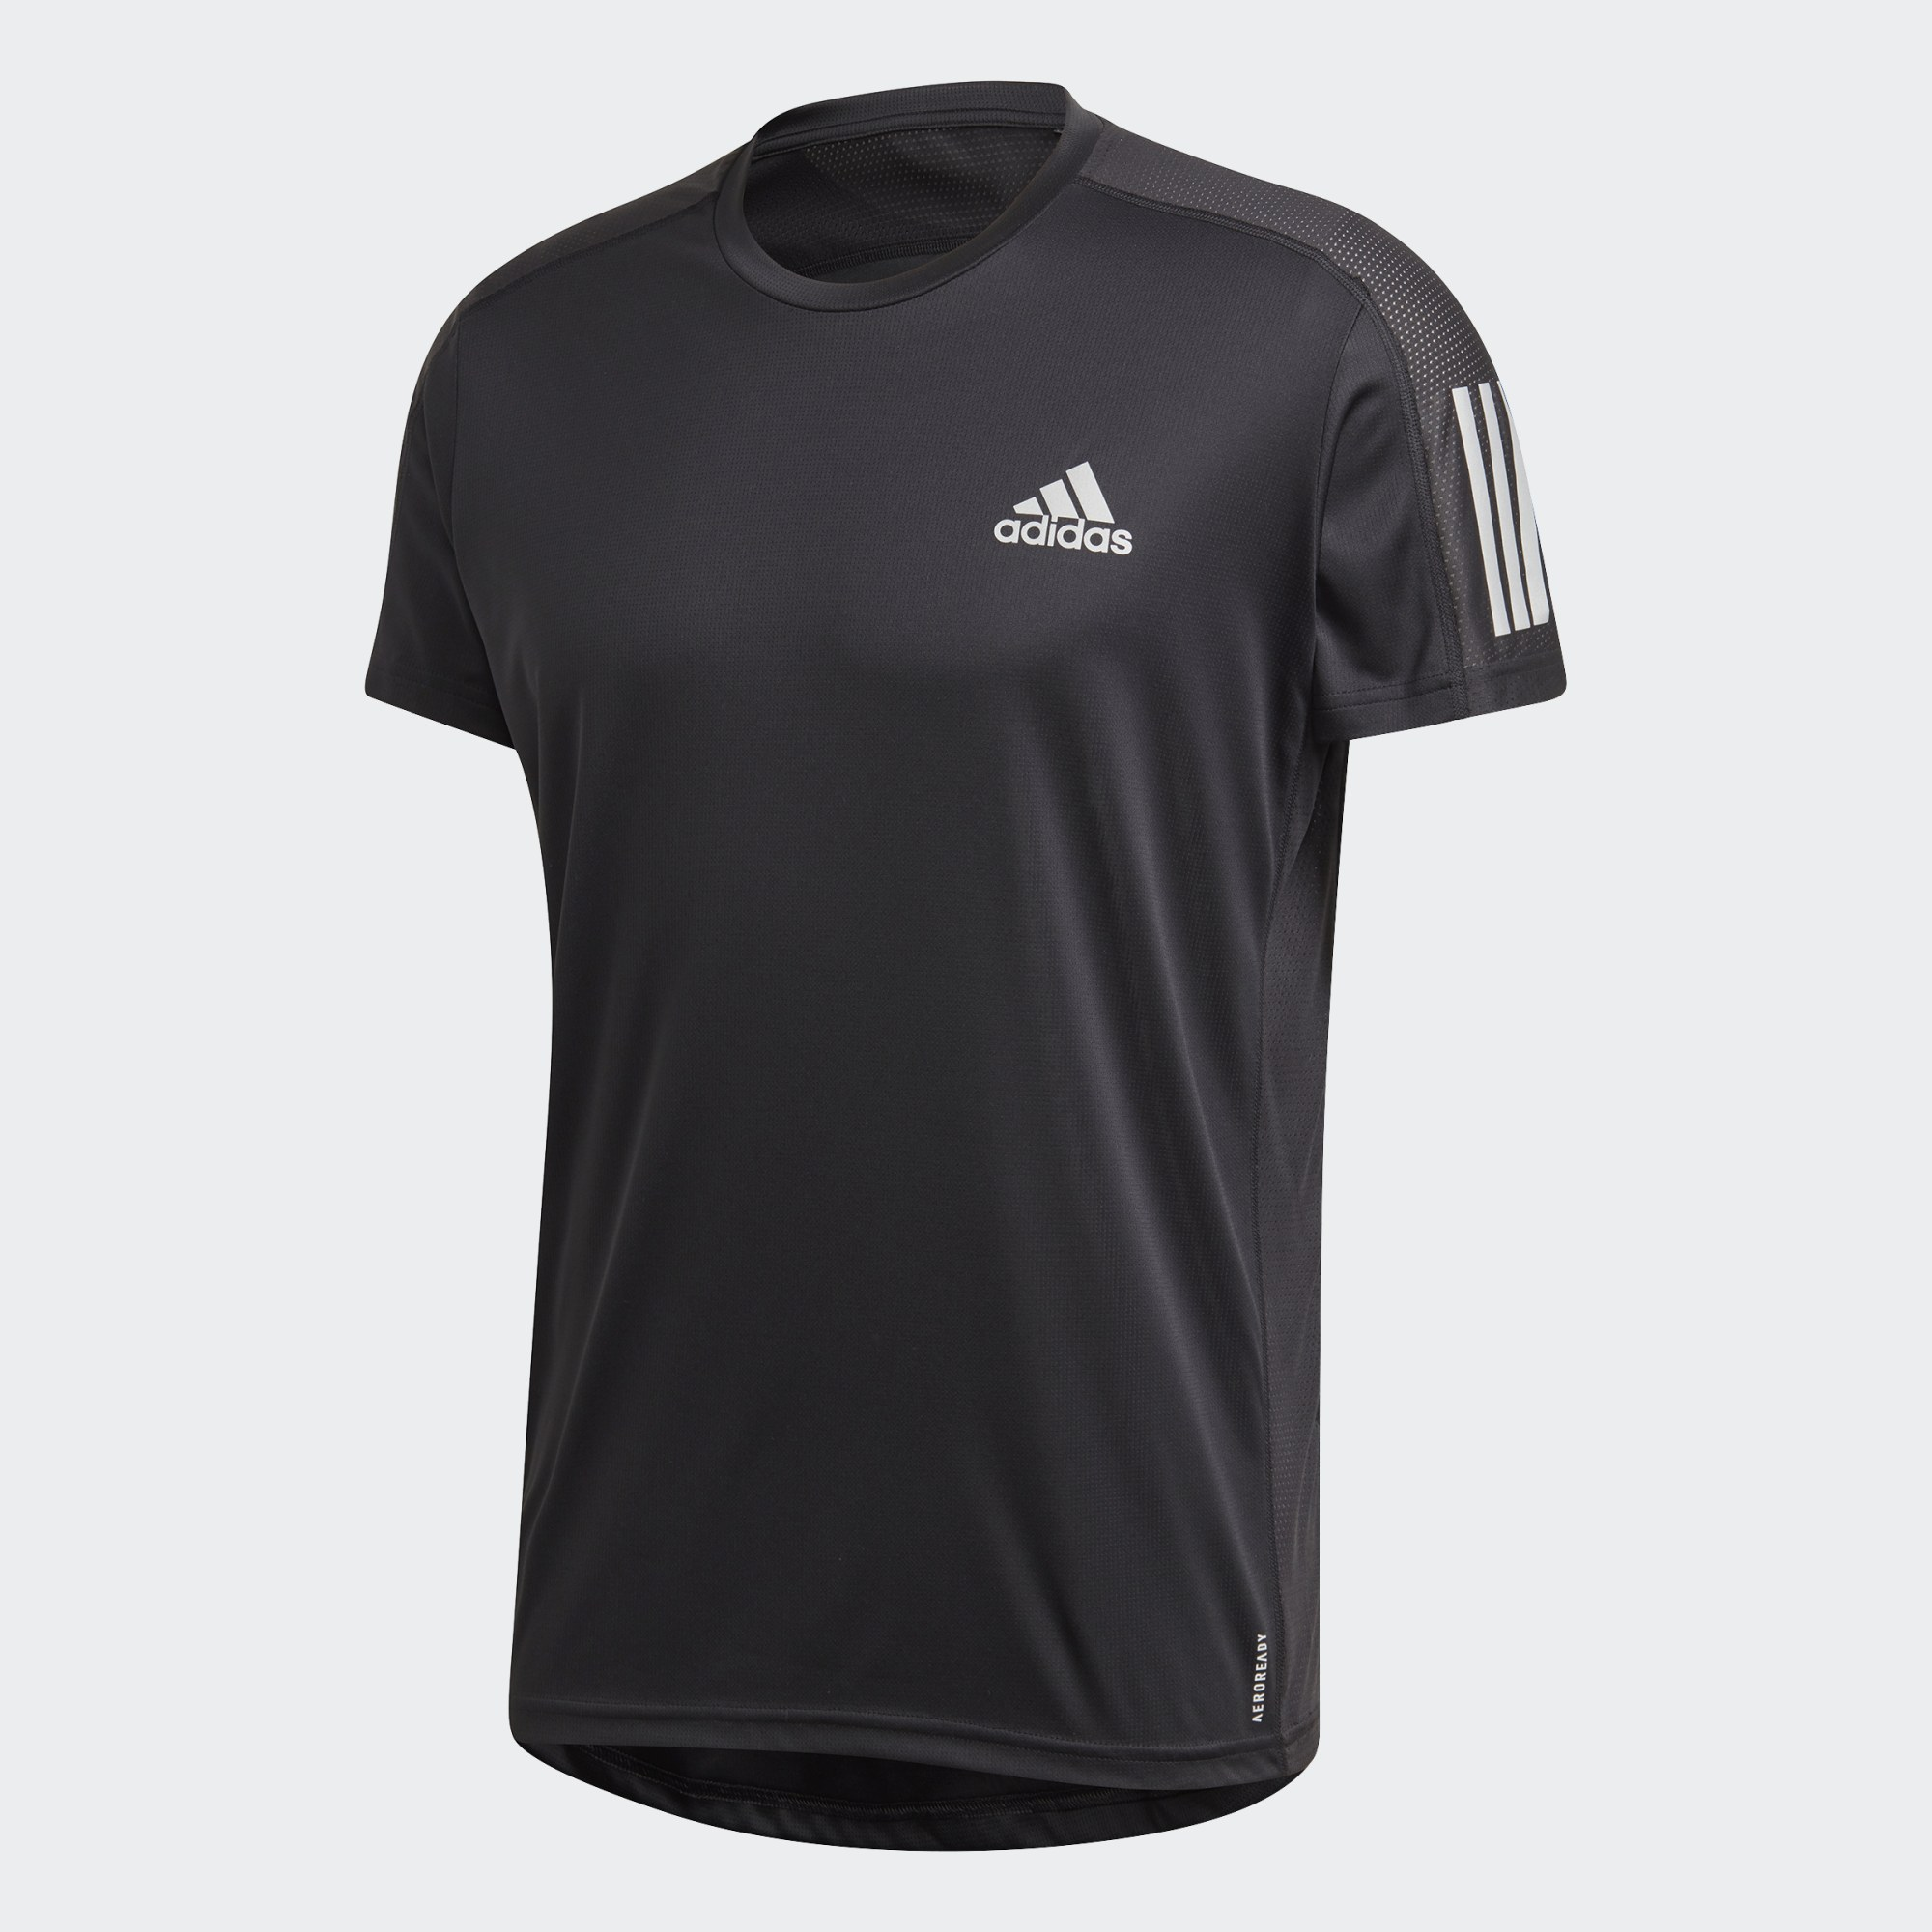 Own The Run tee – black